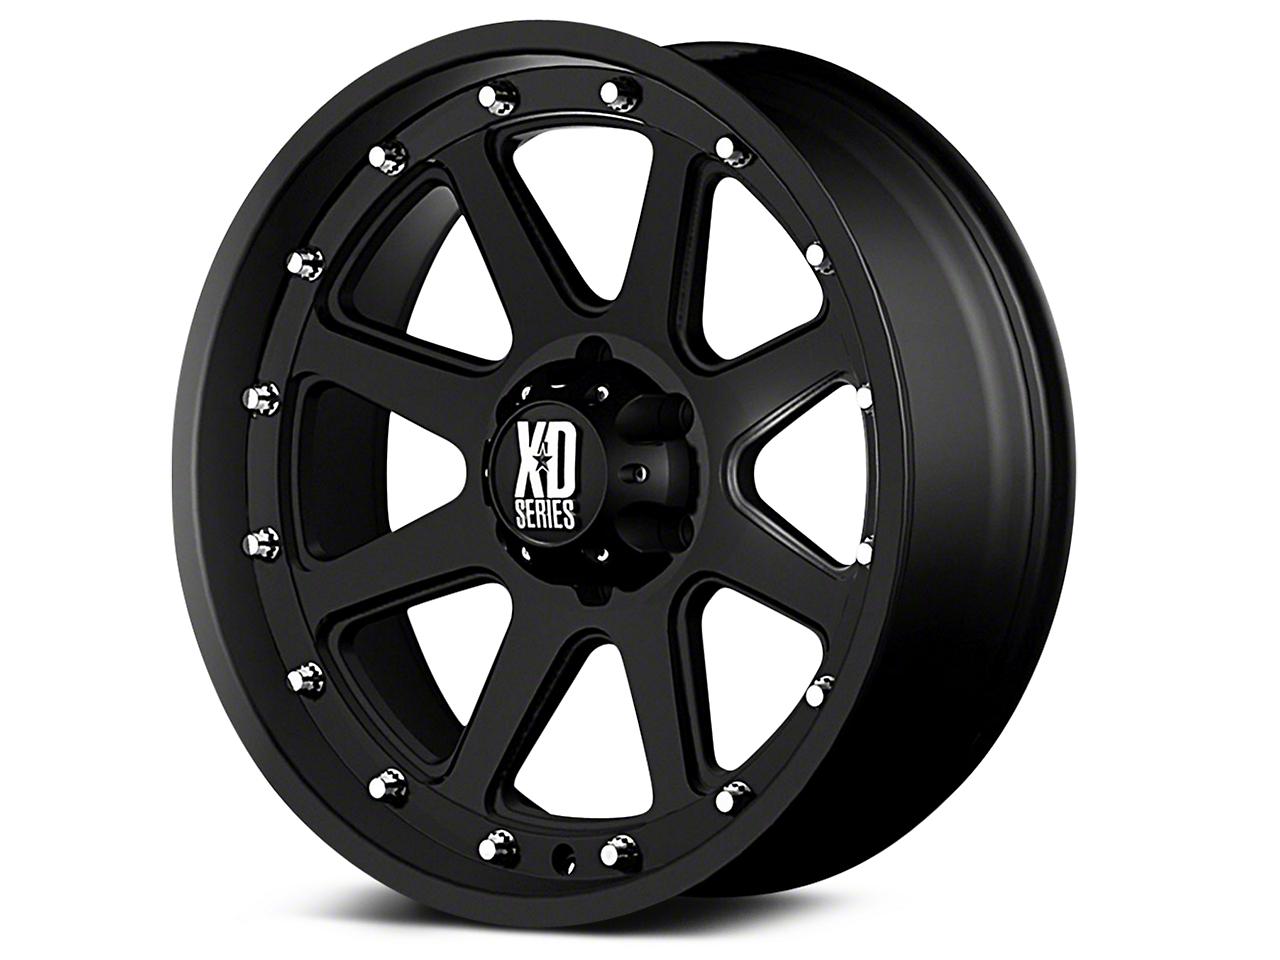 XD Addict Matte Black 6-Lug Wheel - 18x9 (07-18 Silverado 1500)